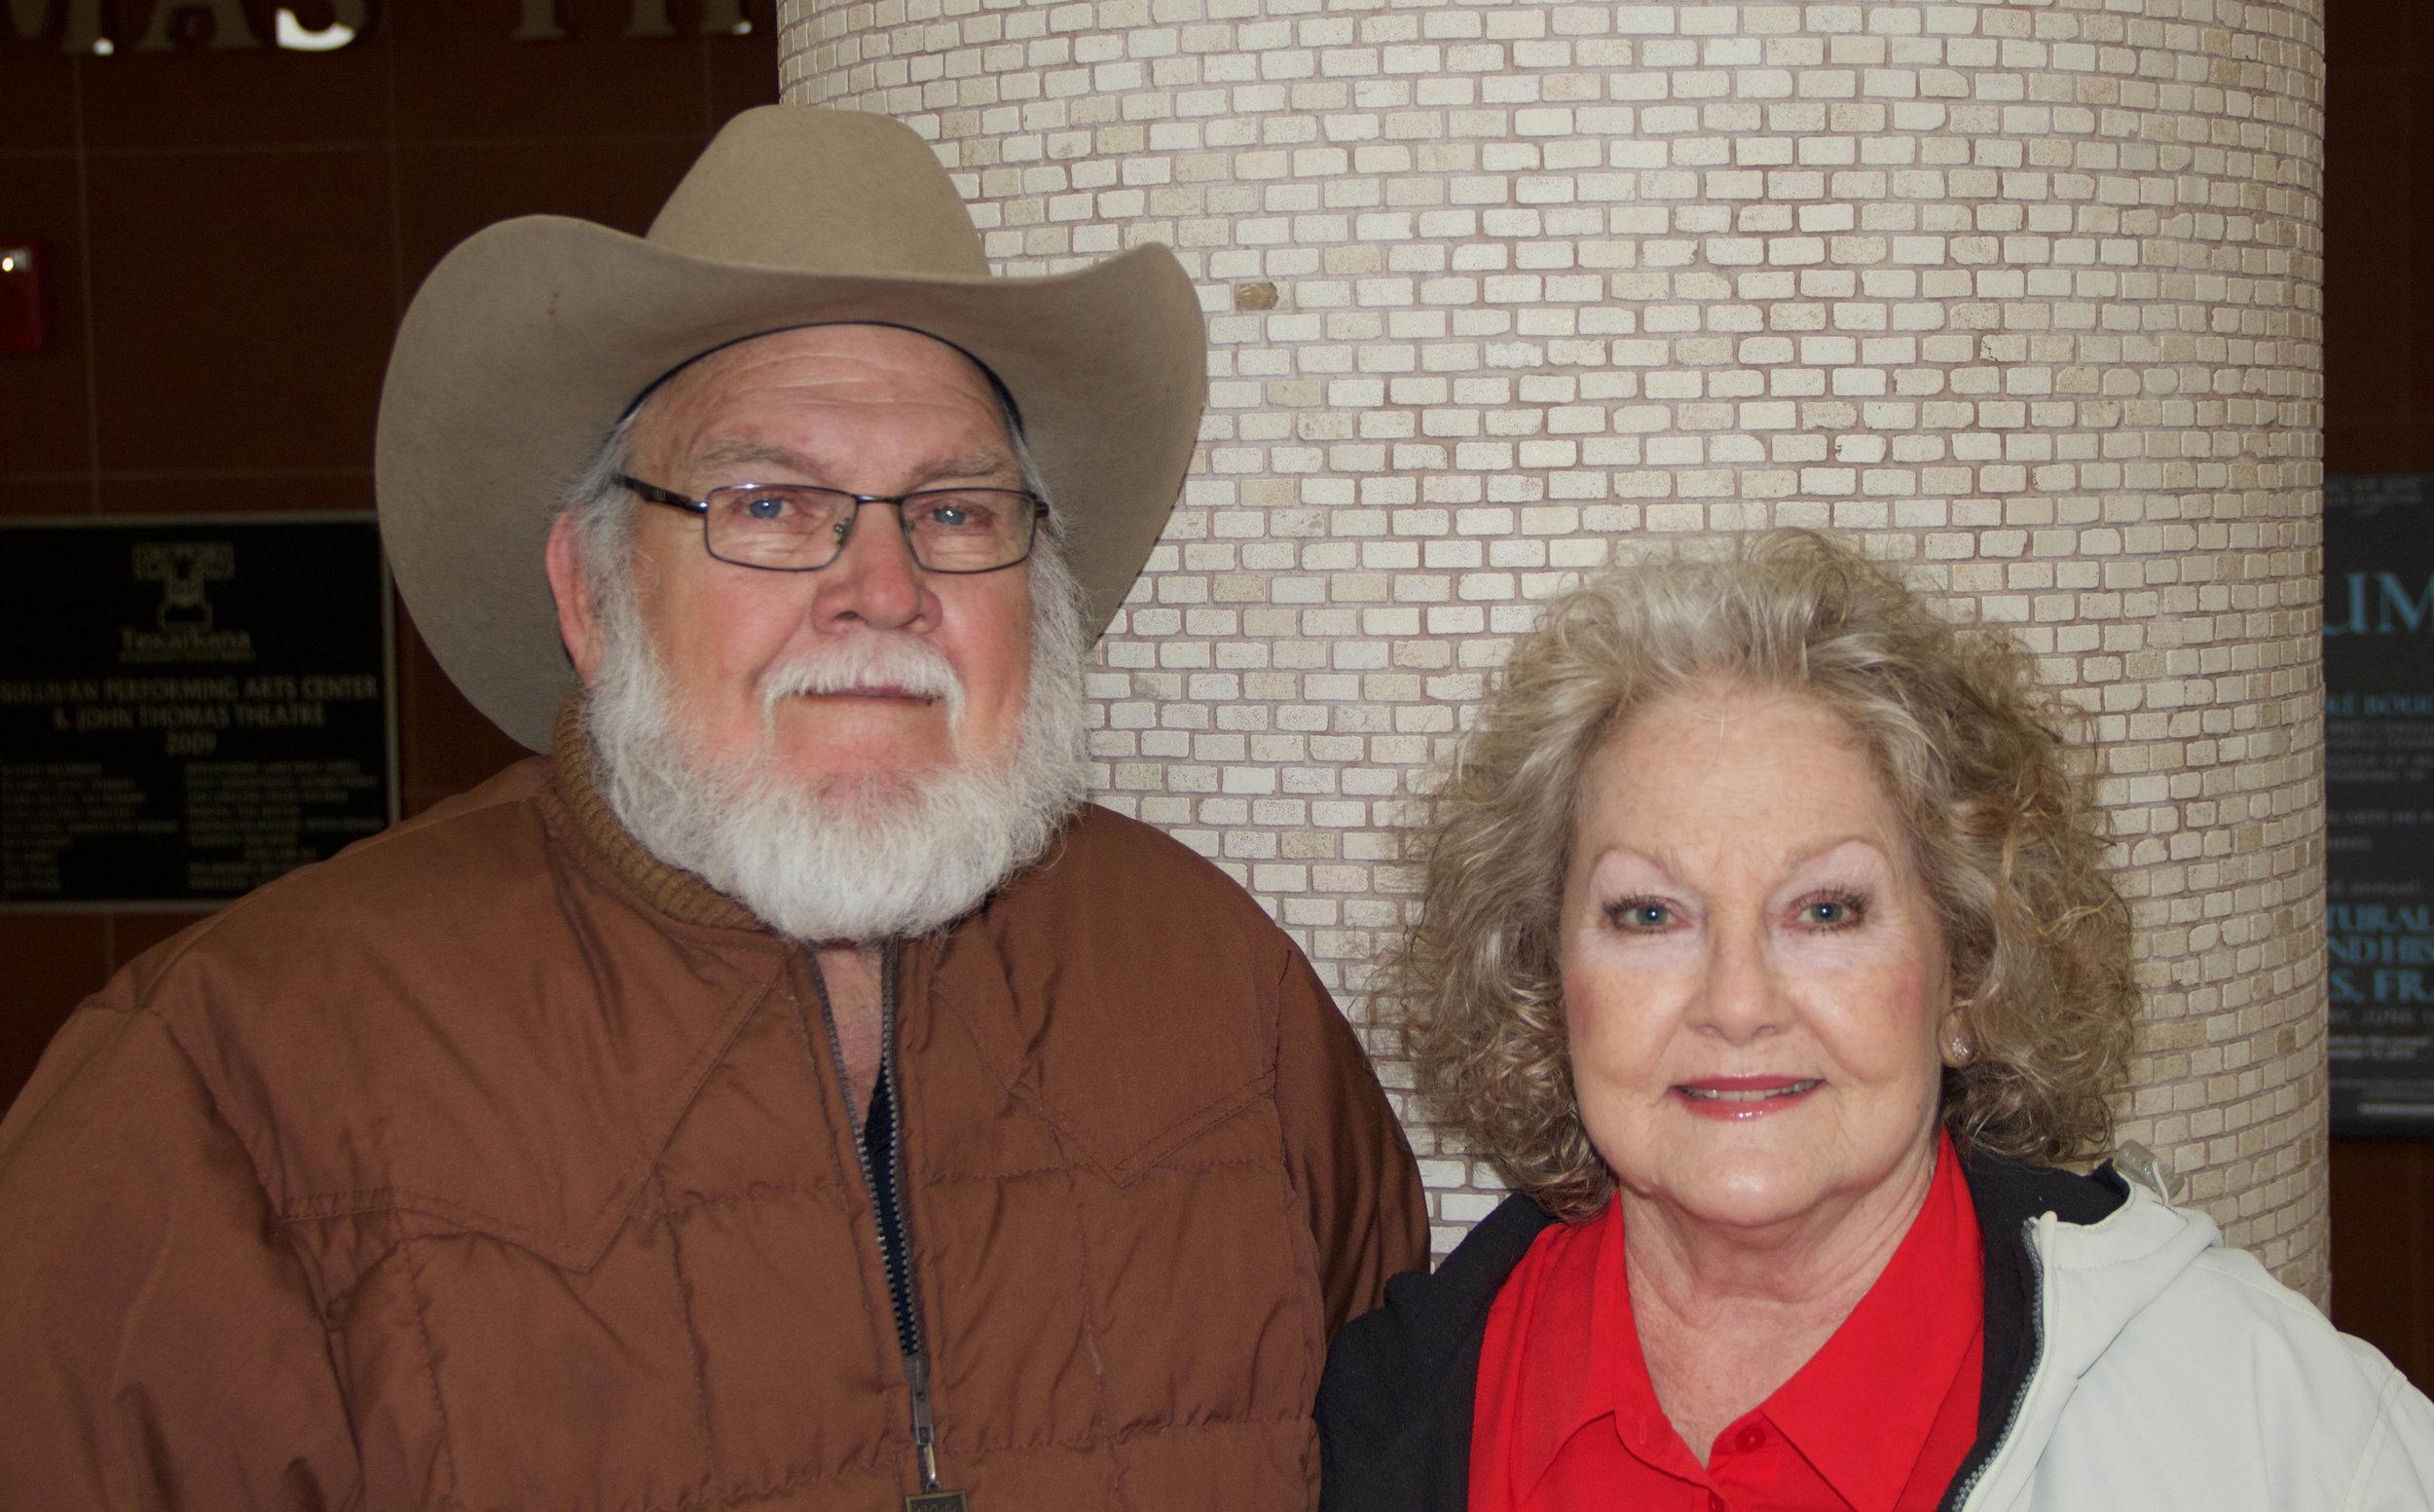 Bill and Patty Jones